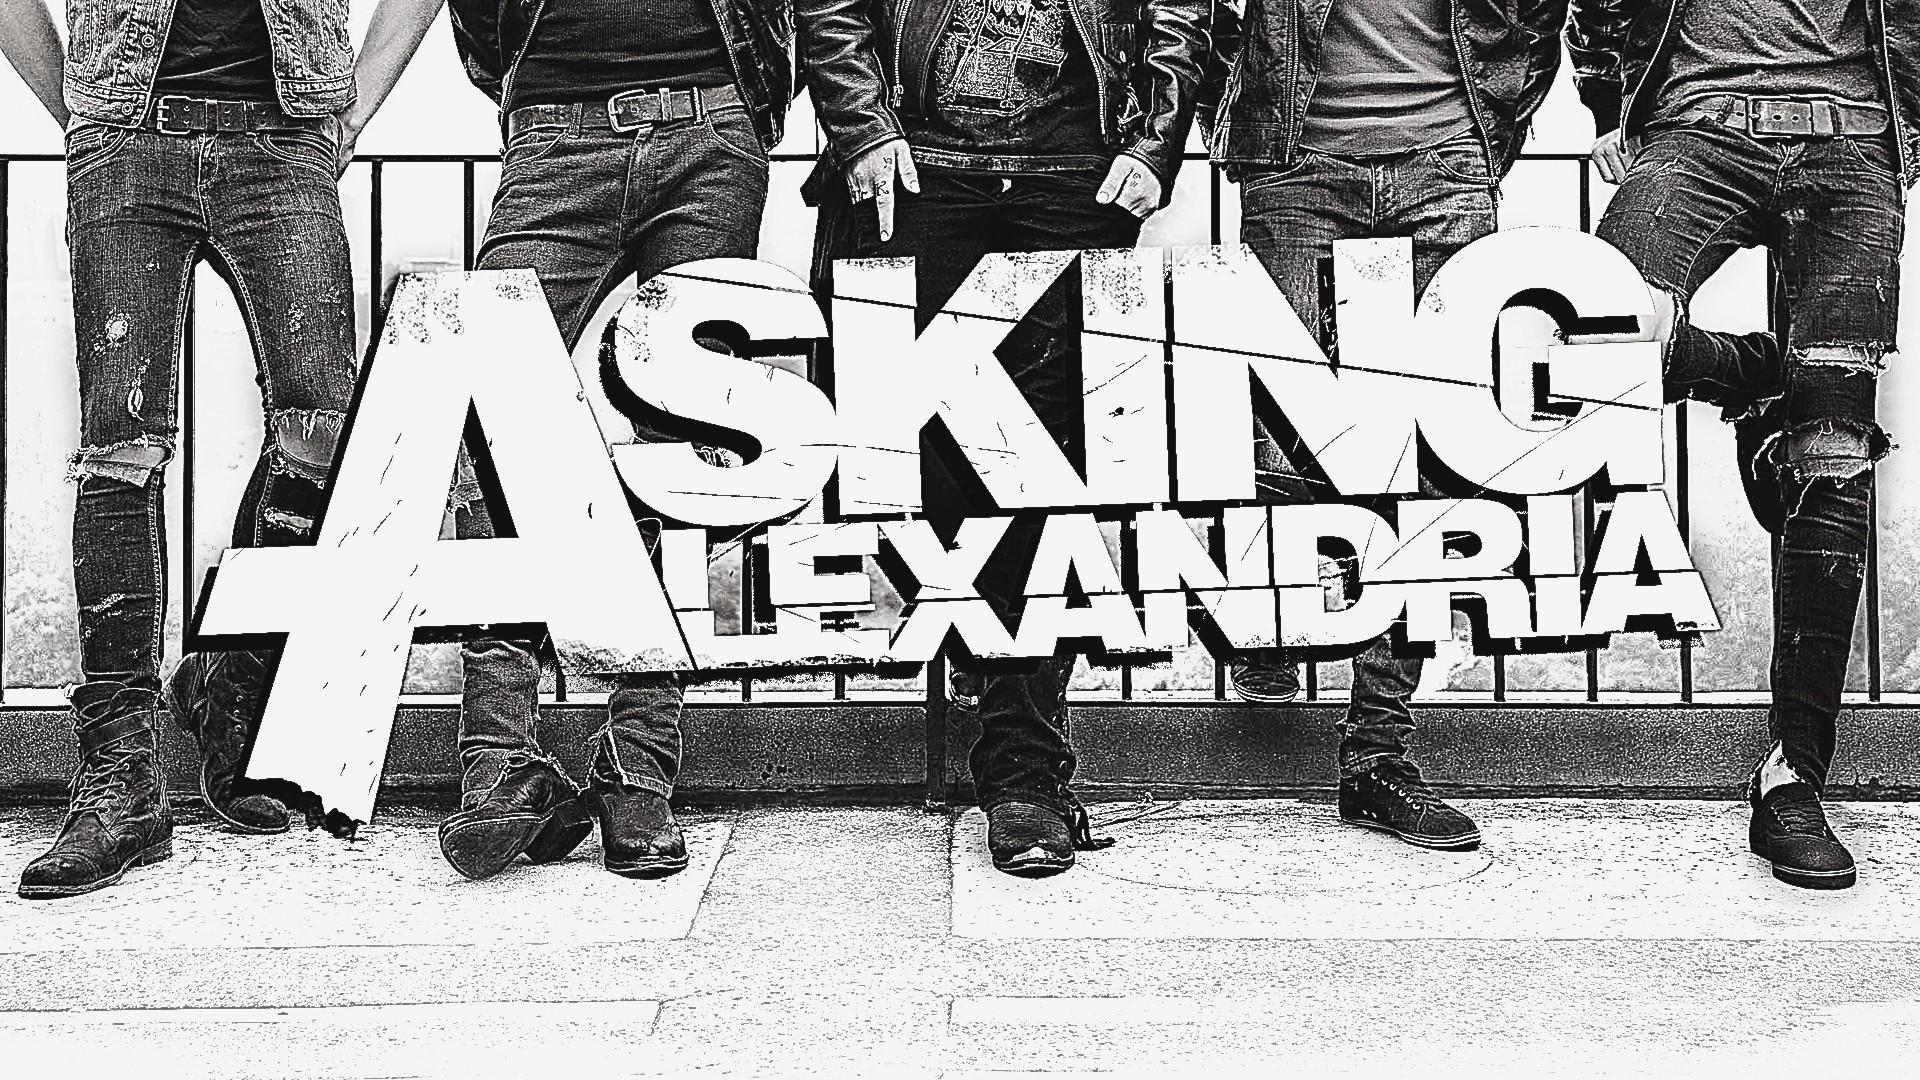 Asking Alexandria Lyrics Wallpaper